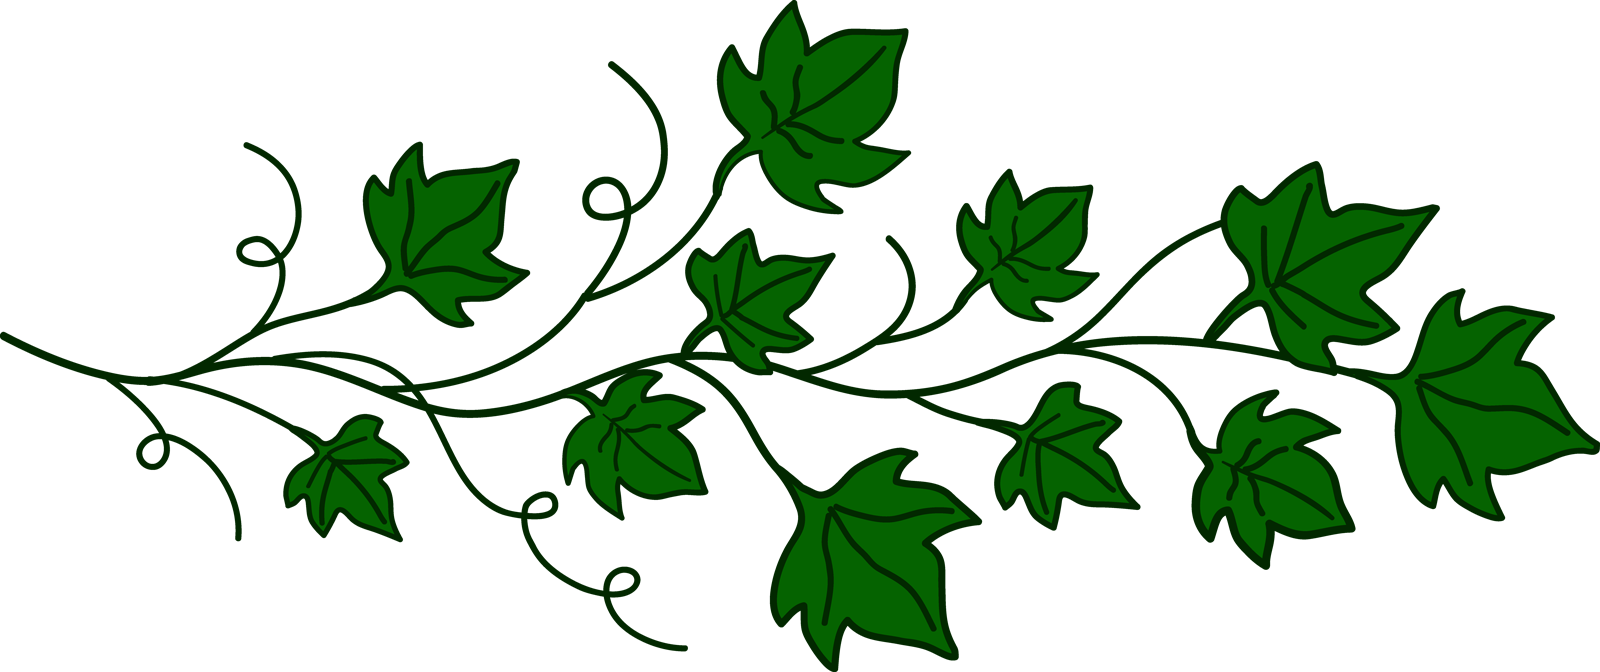 Vine Ivy Clip art.